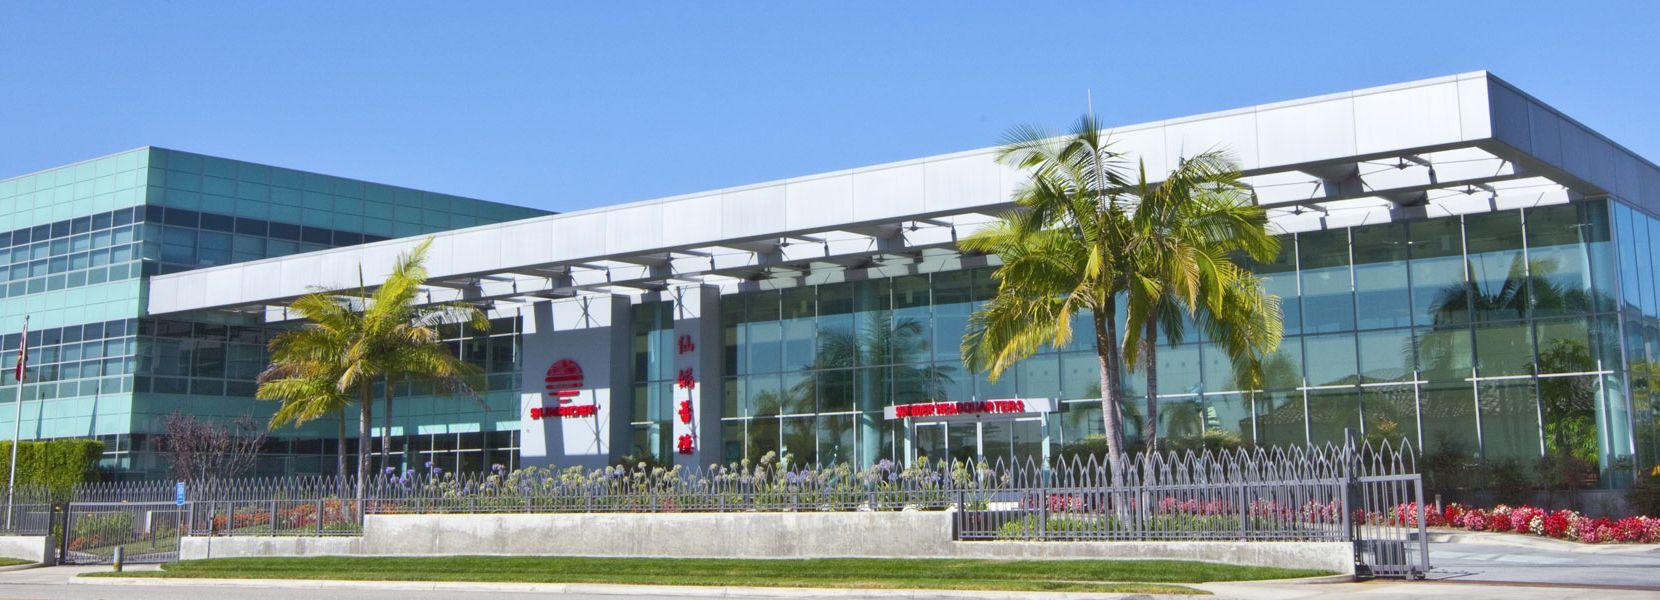 Sunrider International has its headquarters in Torrance, Calif.